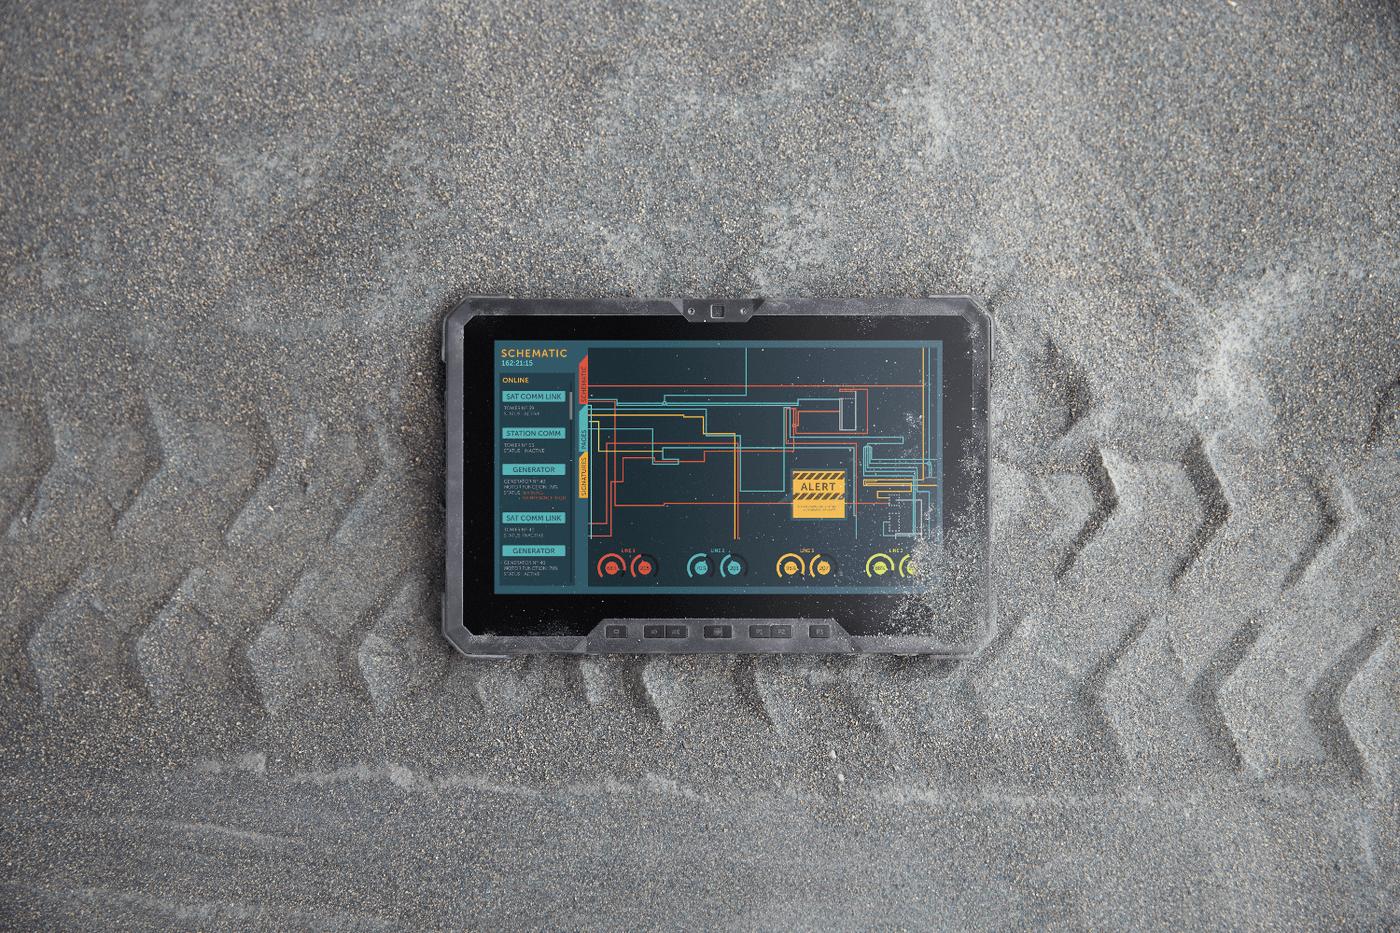 dell-latitude-12-rugged-tablet-210715